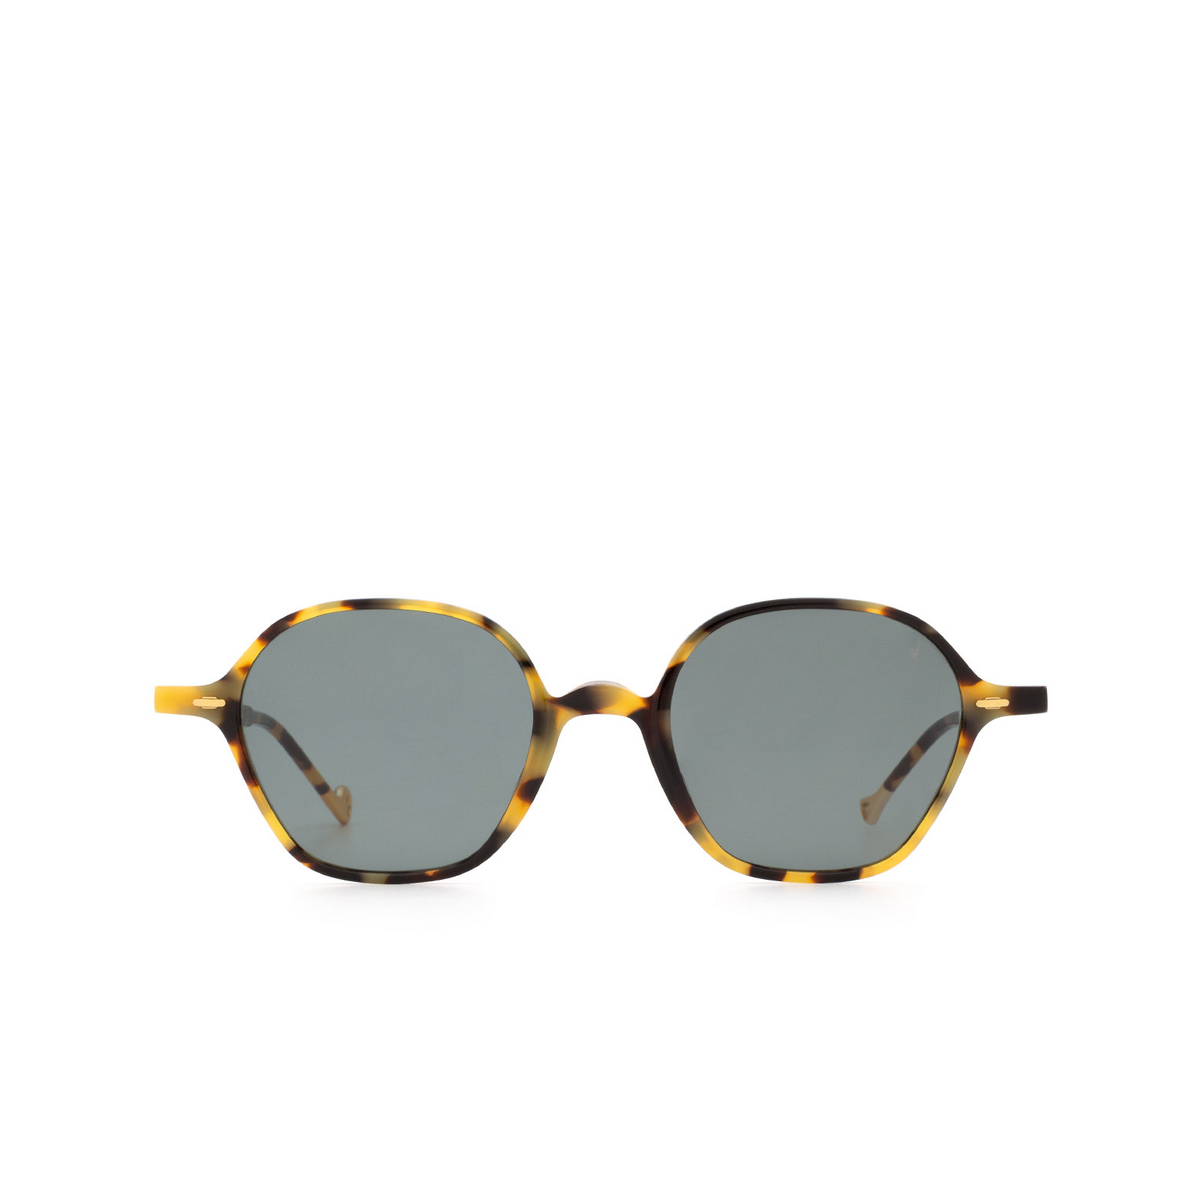 Eyepetizer® Irregular Sunglasses: Visconti color Havana C.F-40 - front view.